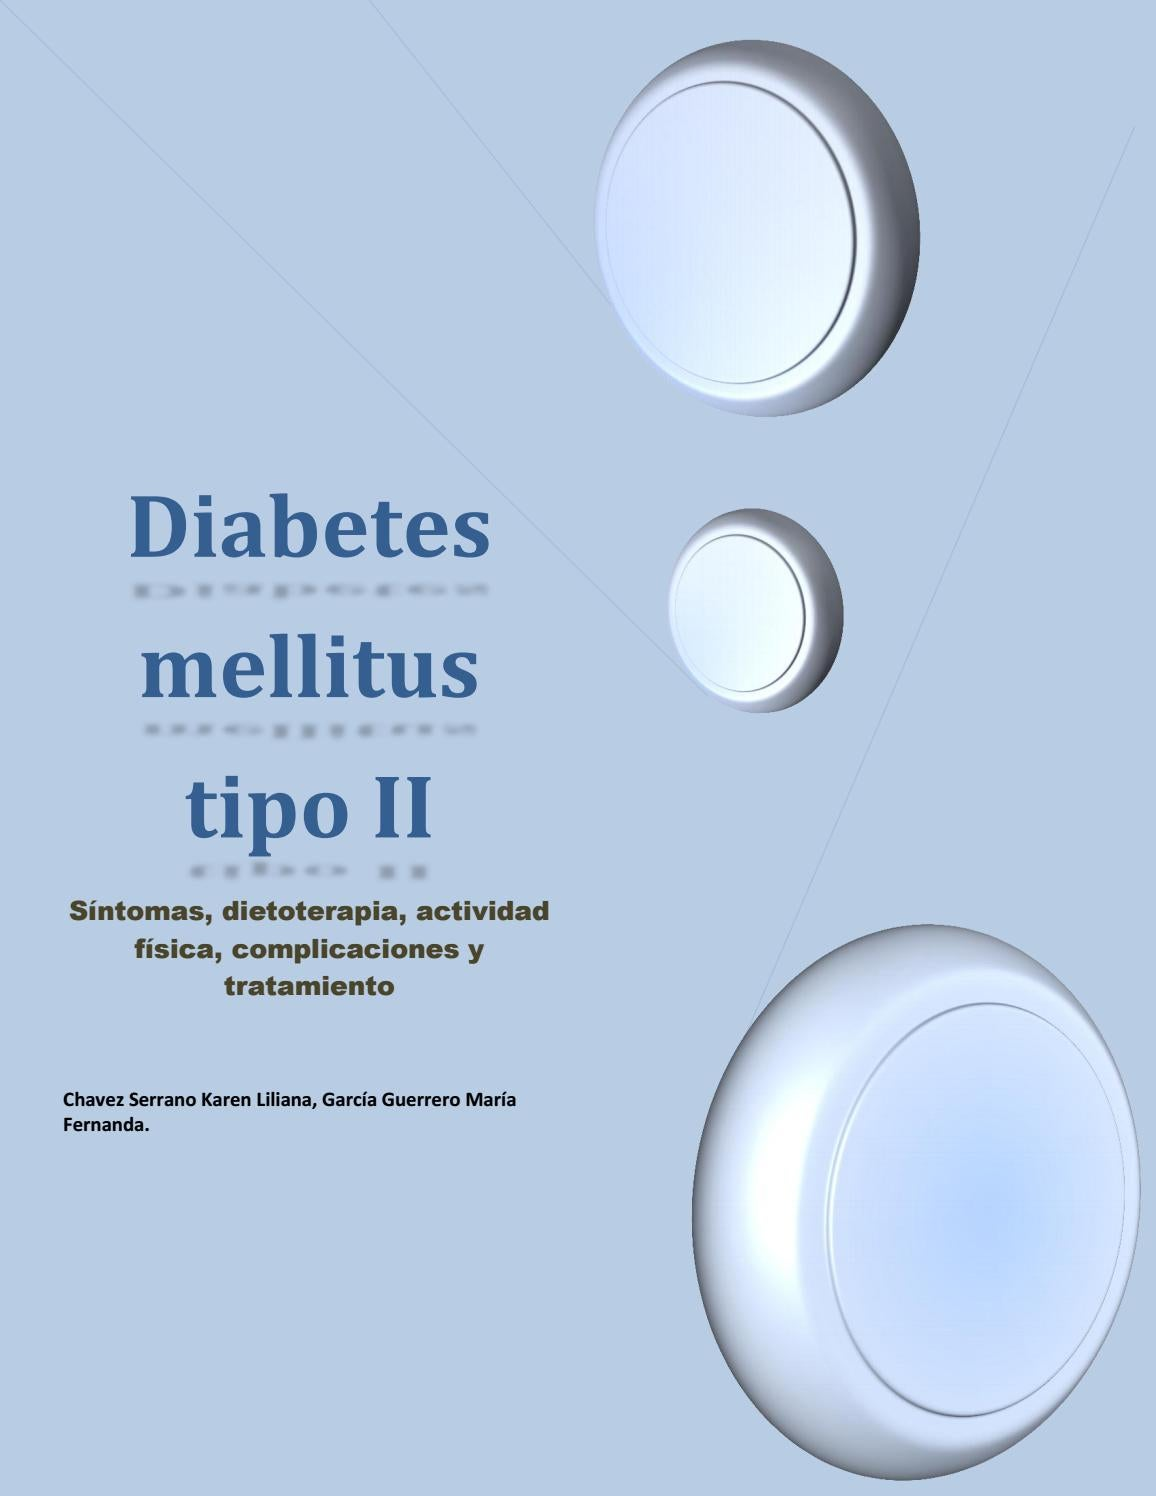 dientes flojos por diabetes mellitus